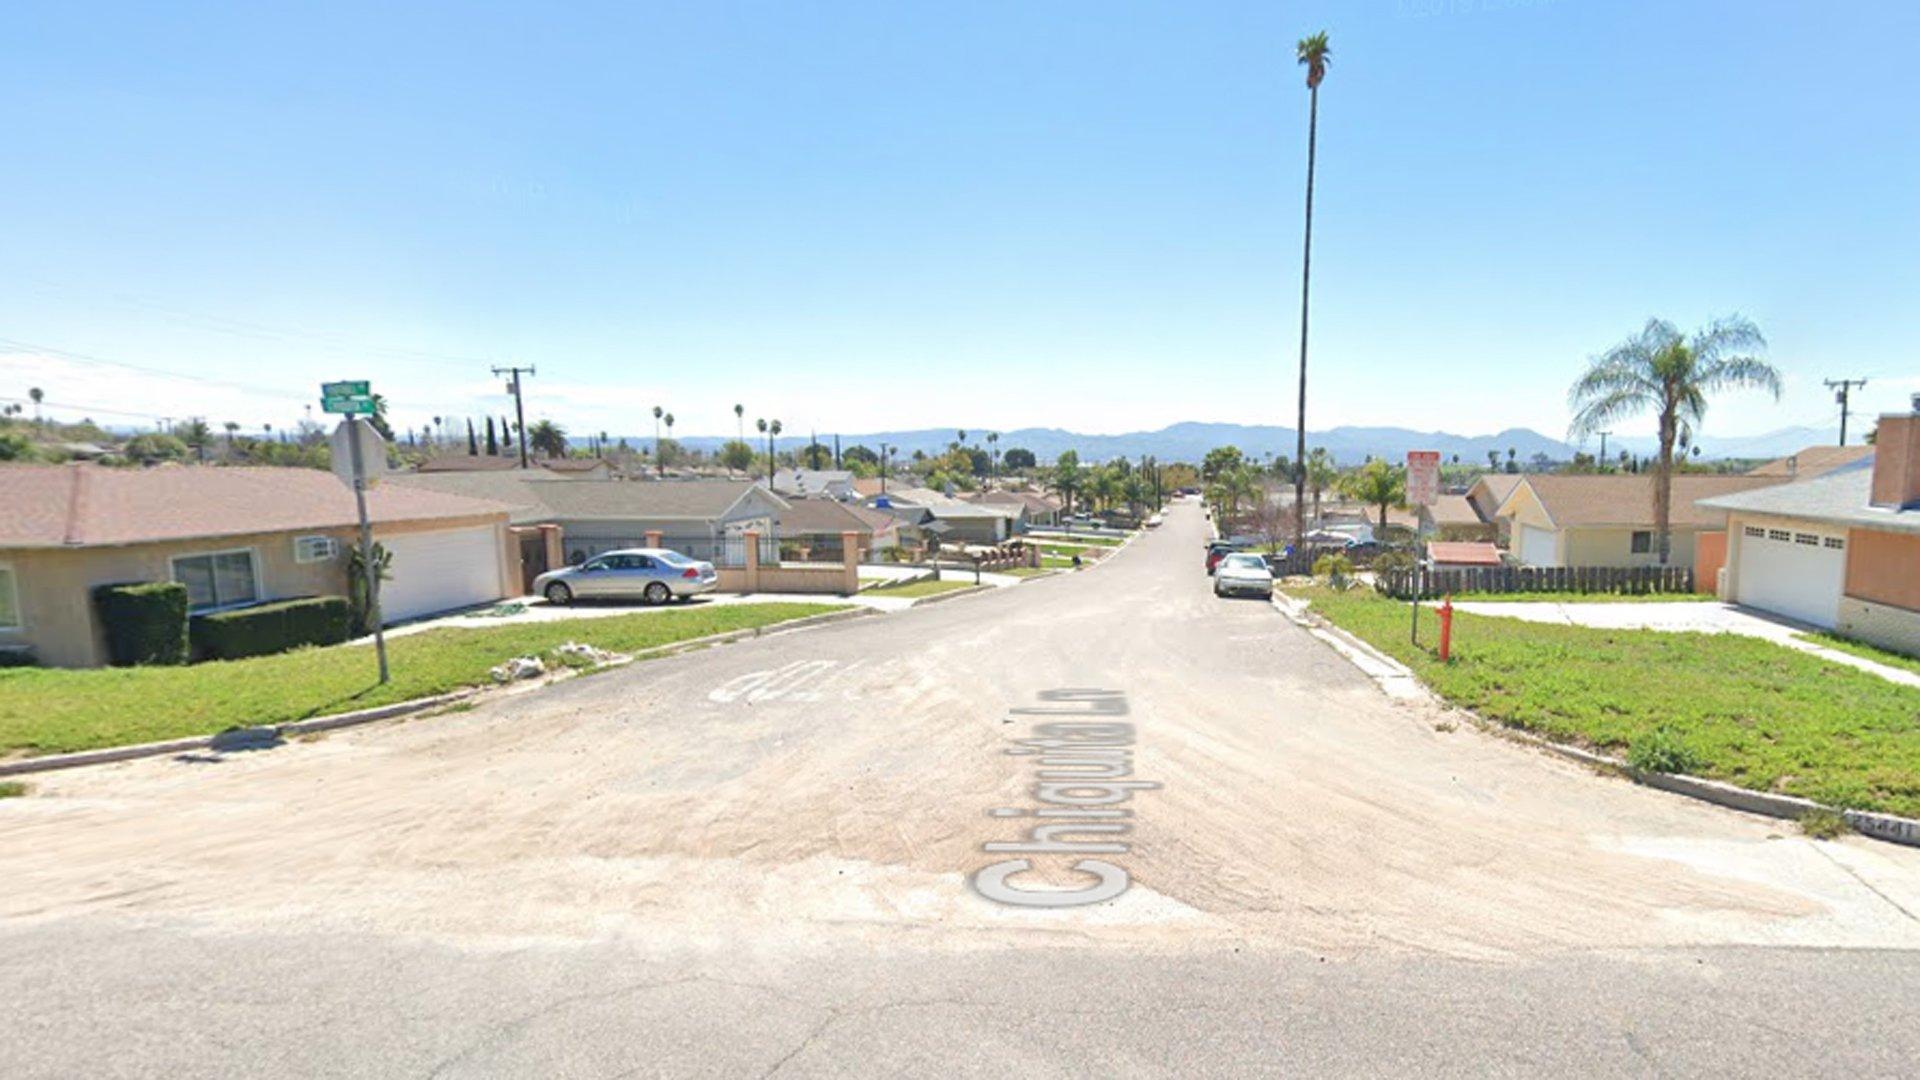 The 5300 block of Chiquita Lane in San Bernardino, as viewed in a Google Street View image.